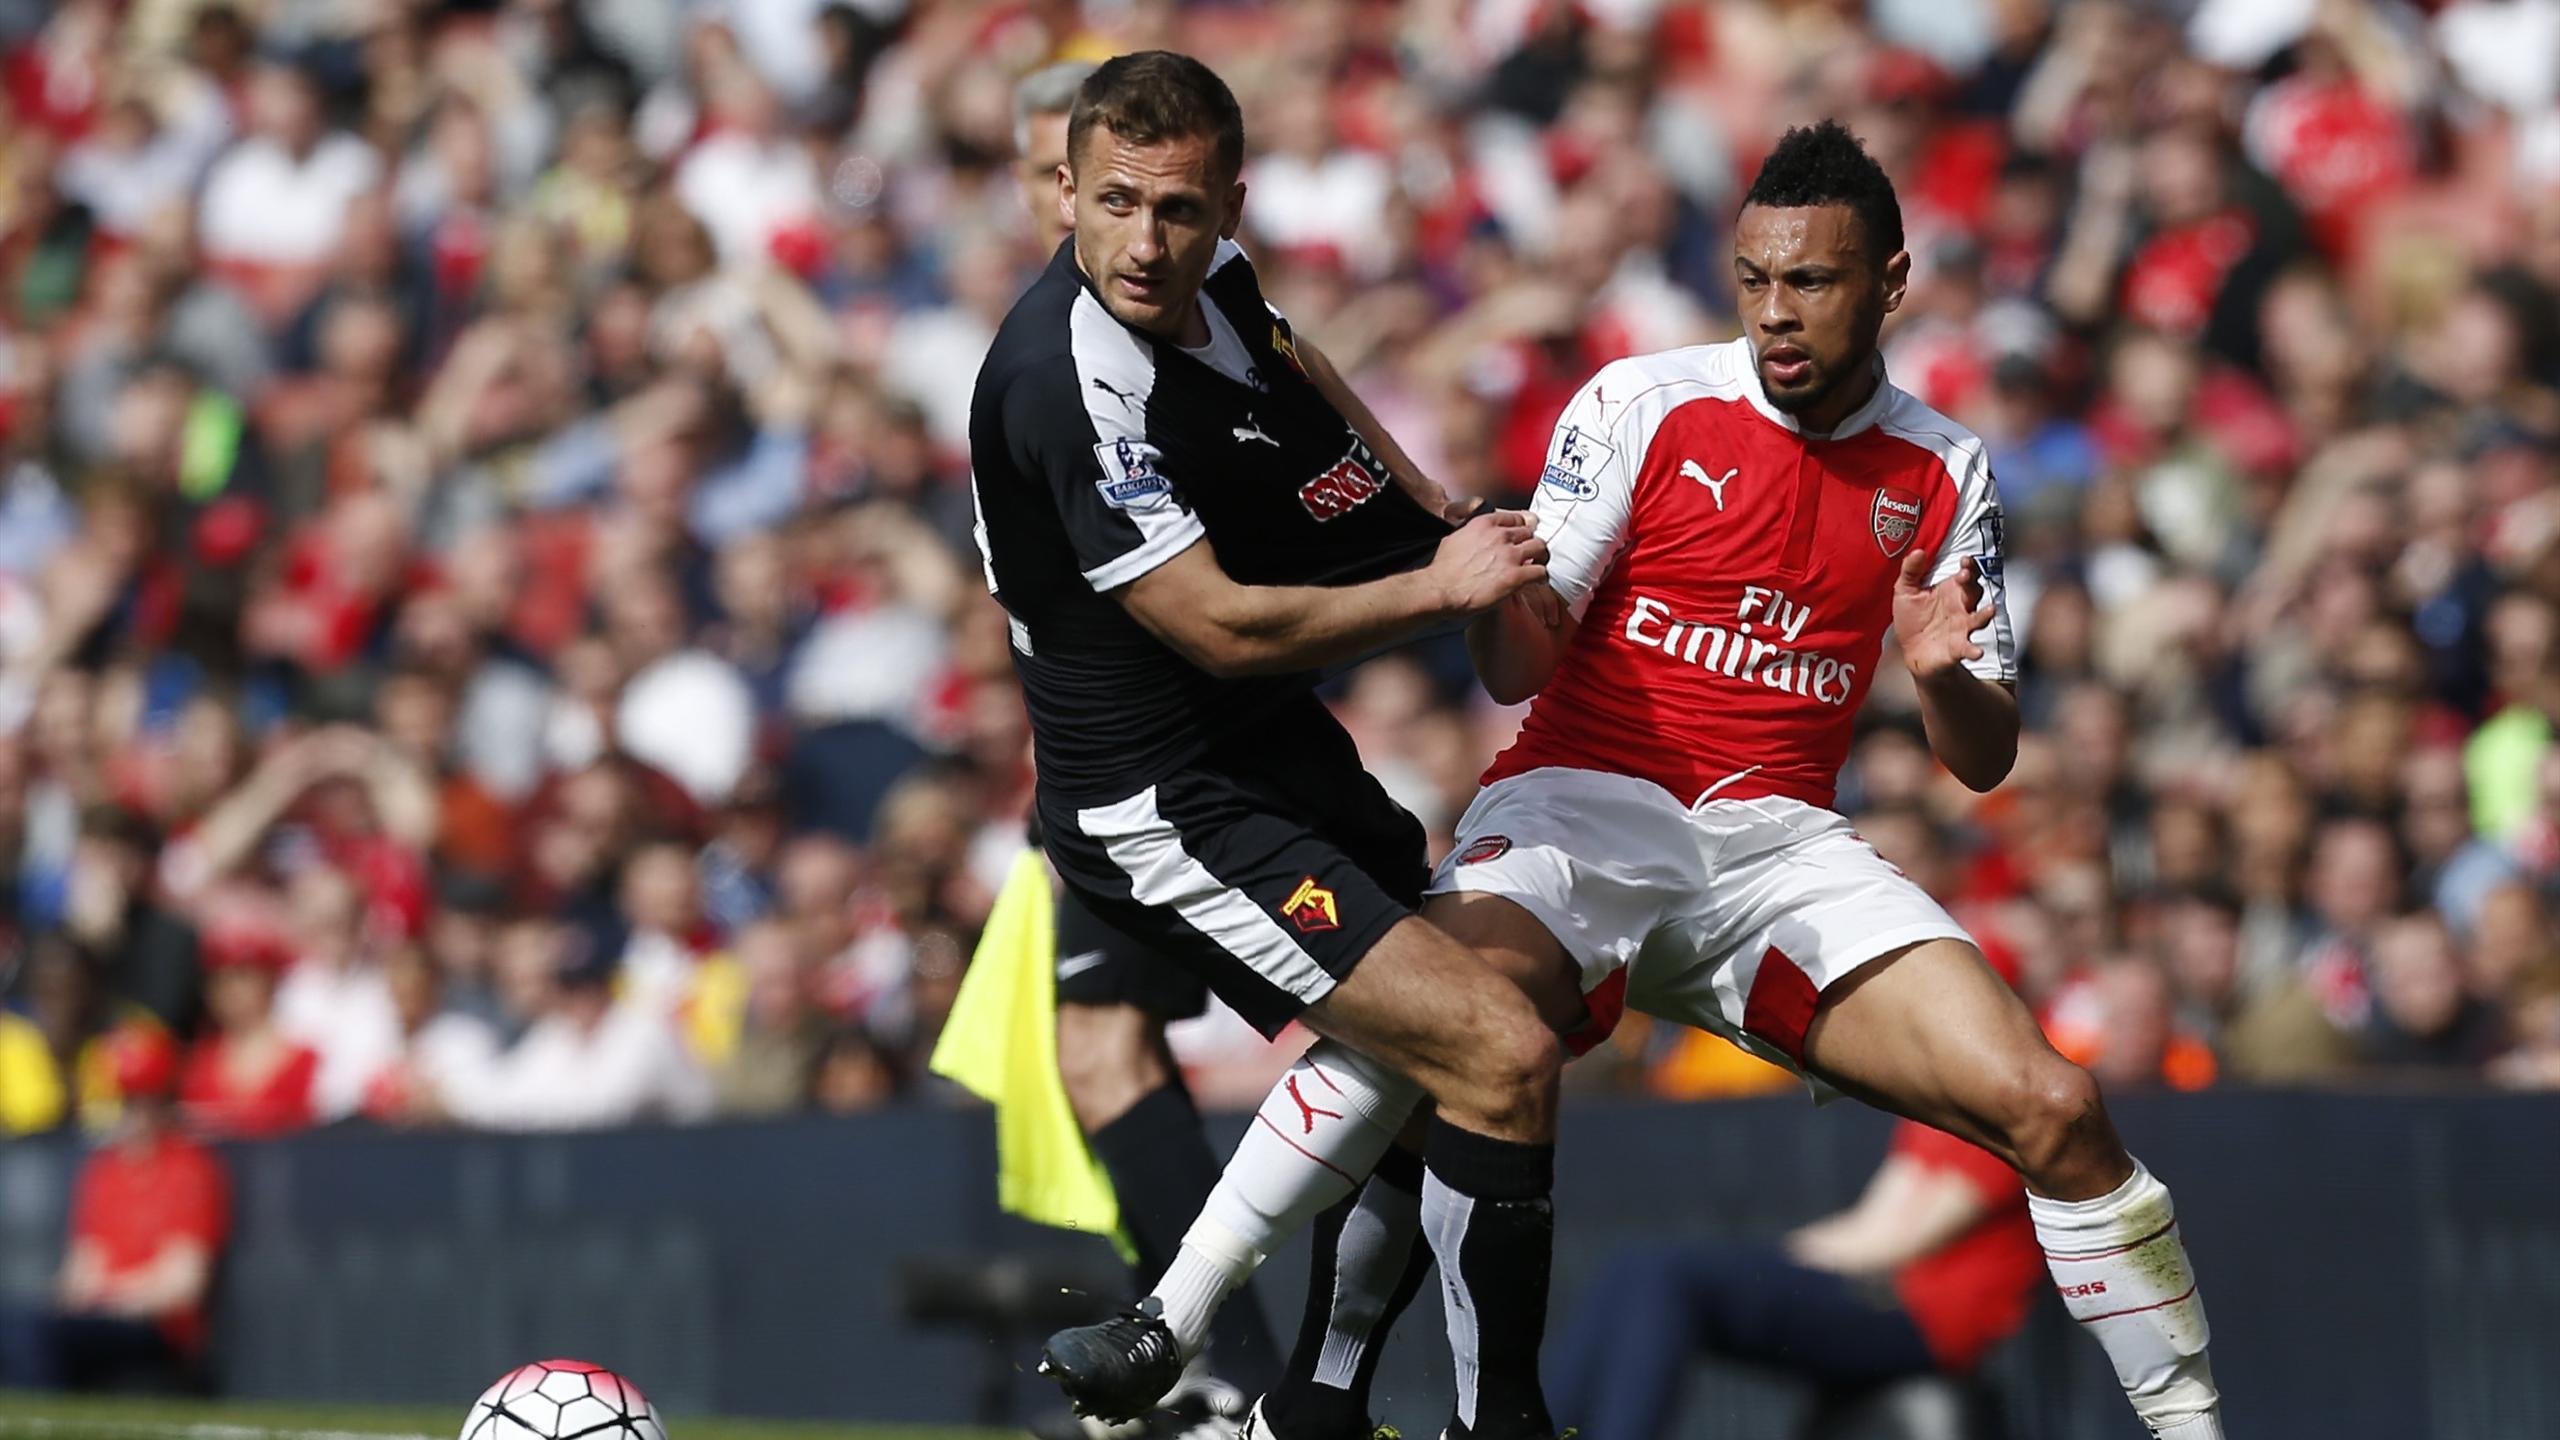 Watford's Yugoslavian-born Swiss midfielder Almen Abdi (L) vies with Arsenal's French midfielder Francis Coquelin